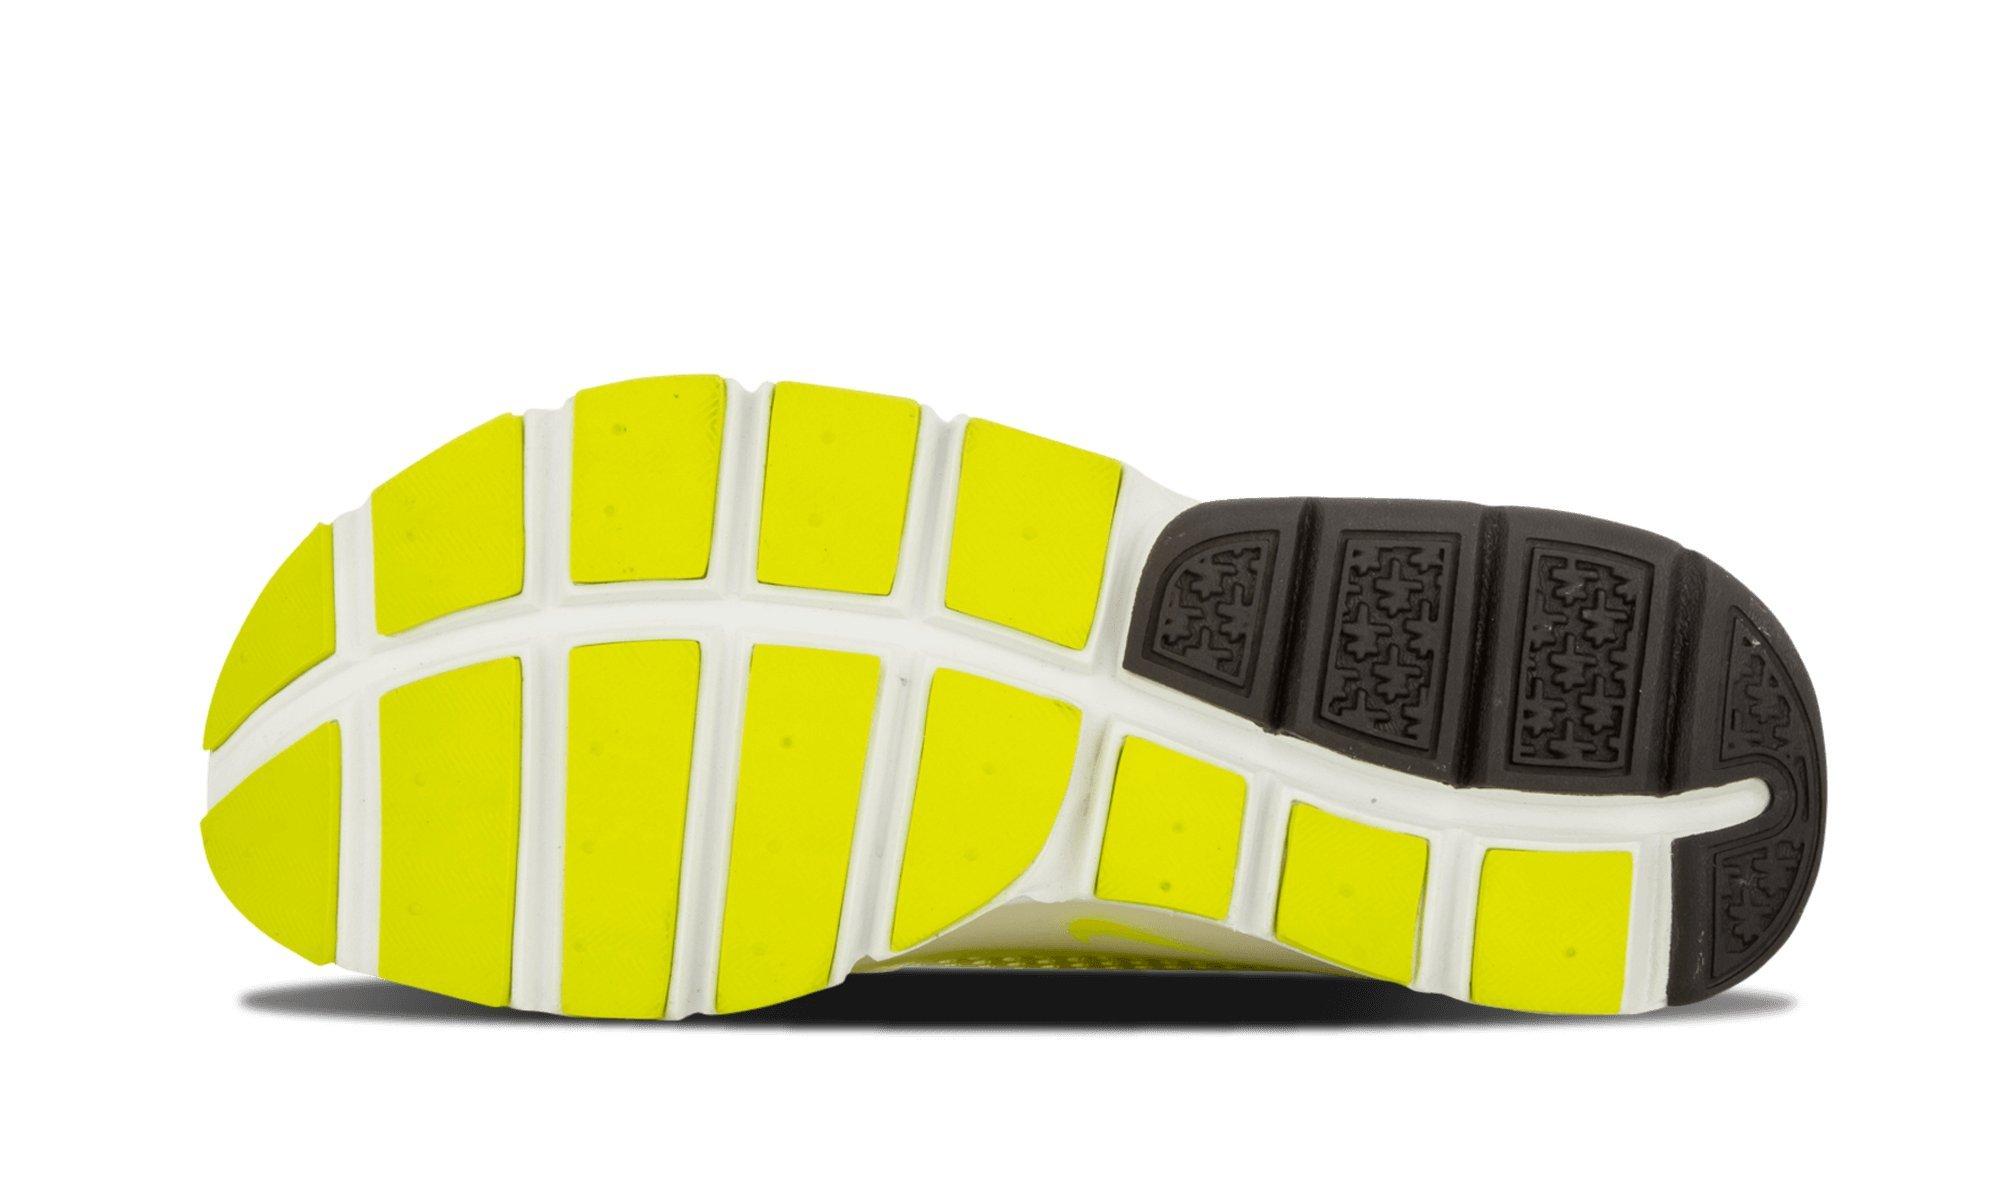 618wiCUAhkL - Nike Men's Sock Dart SP Running Shoes - 686058 771